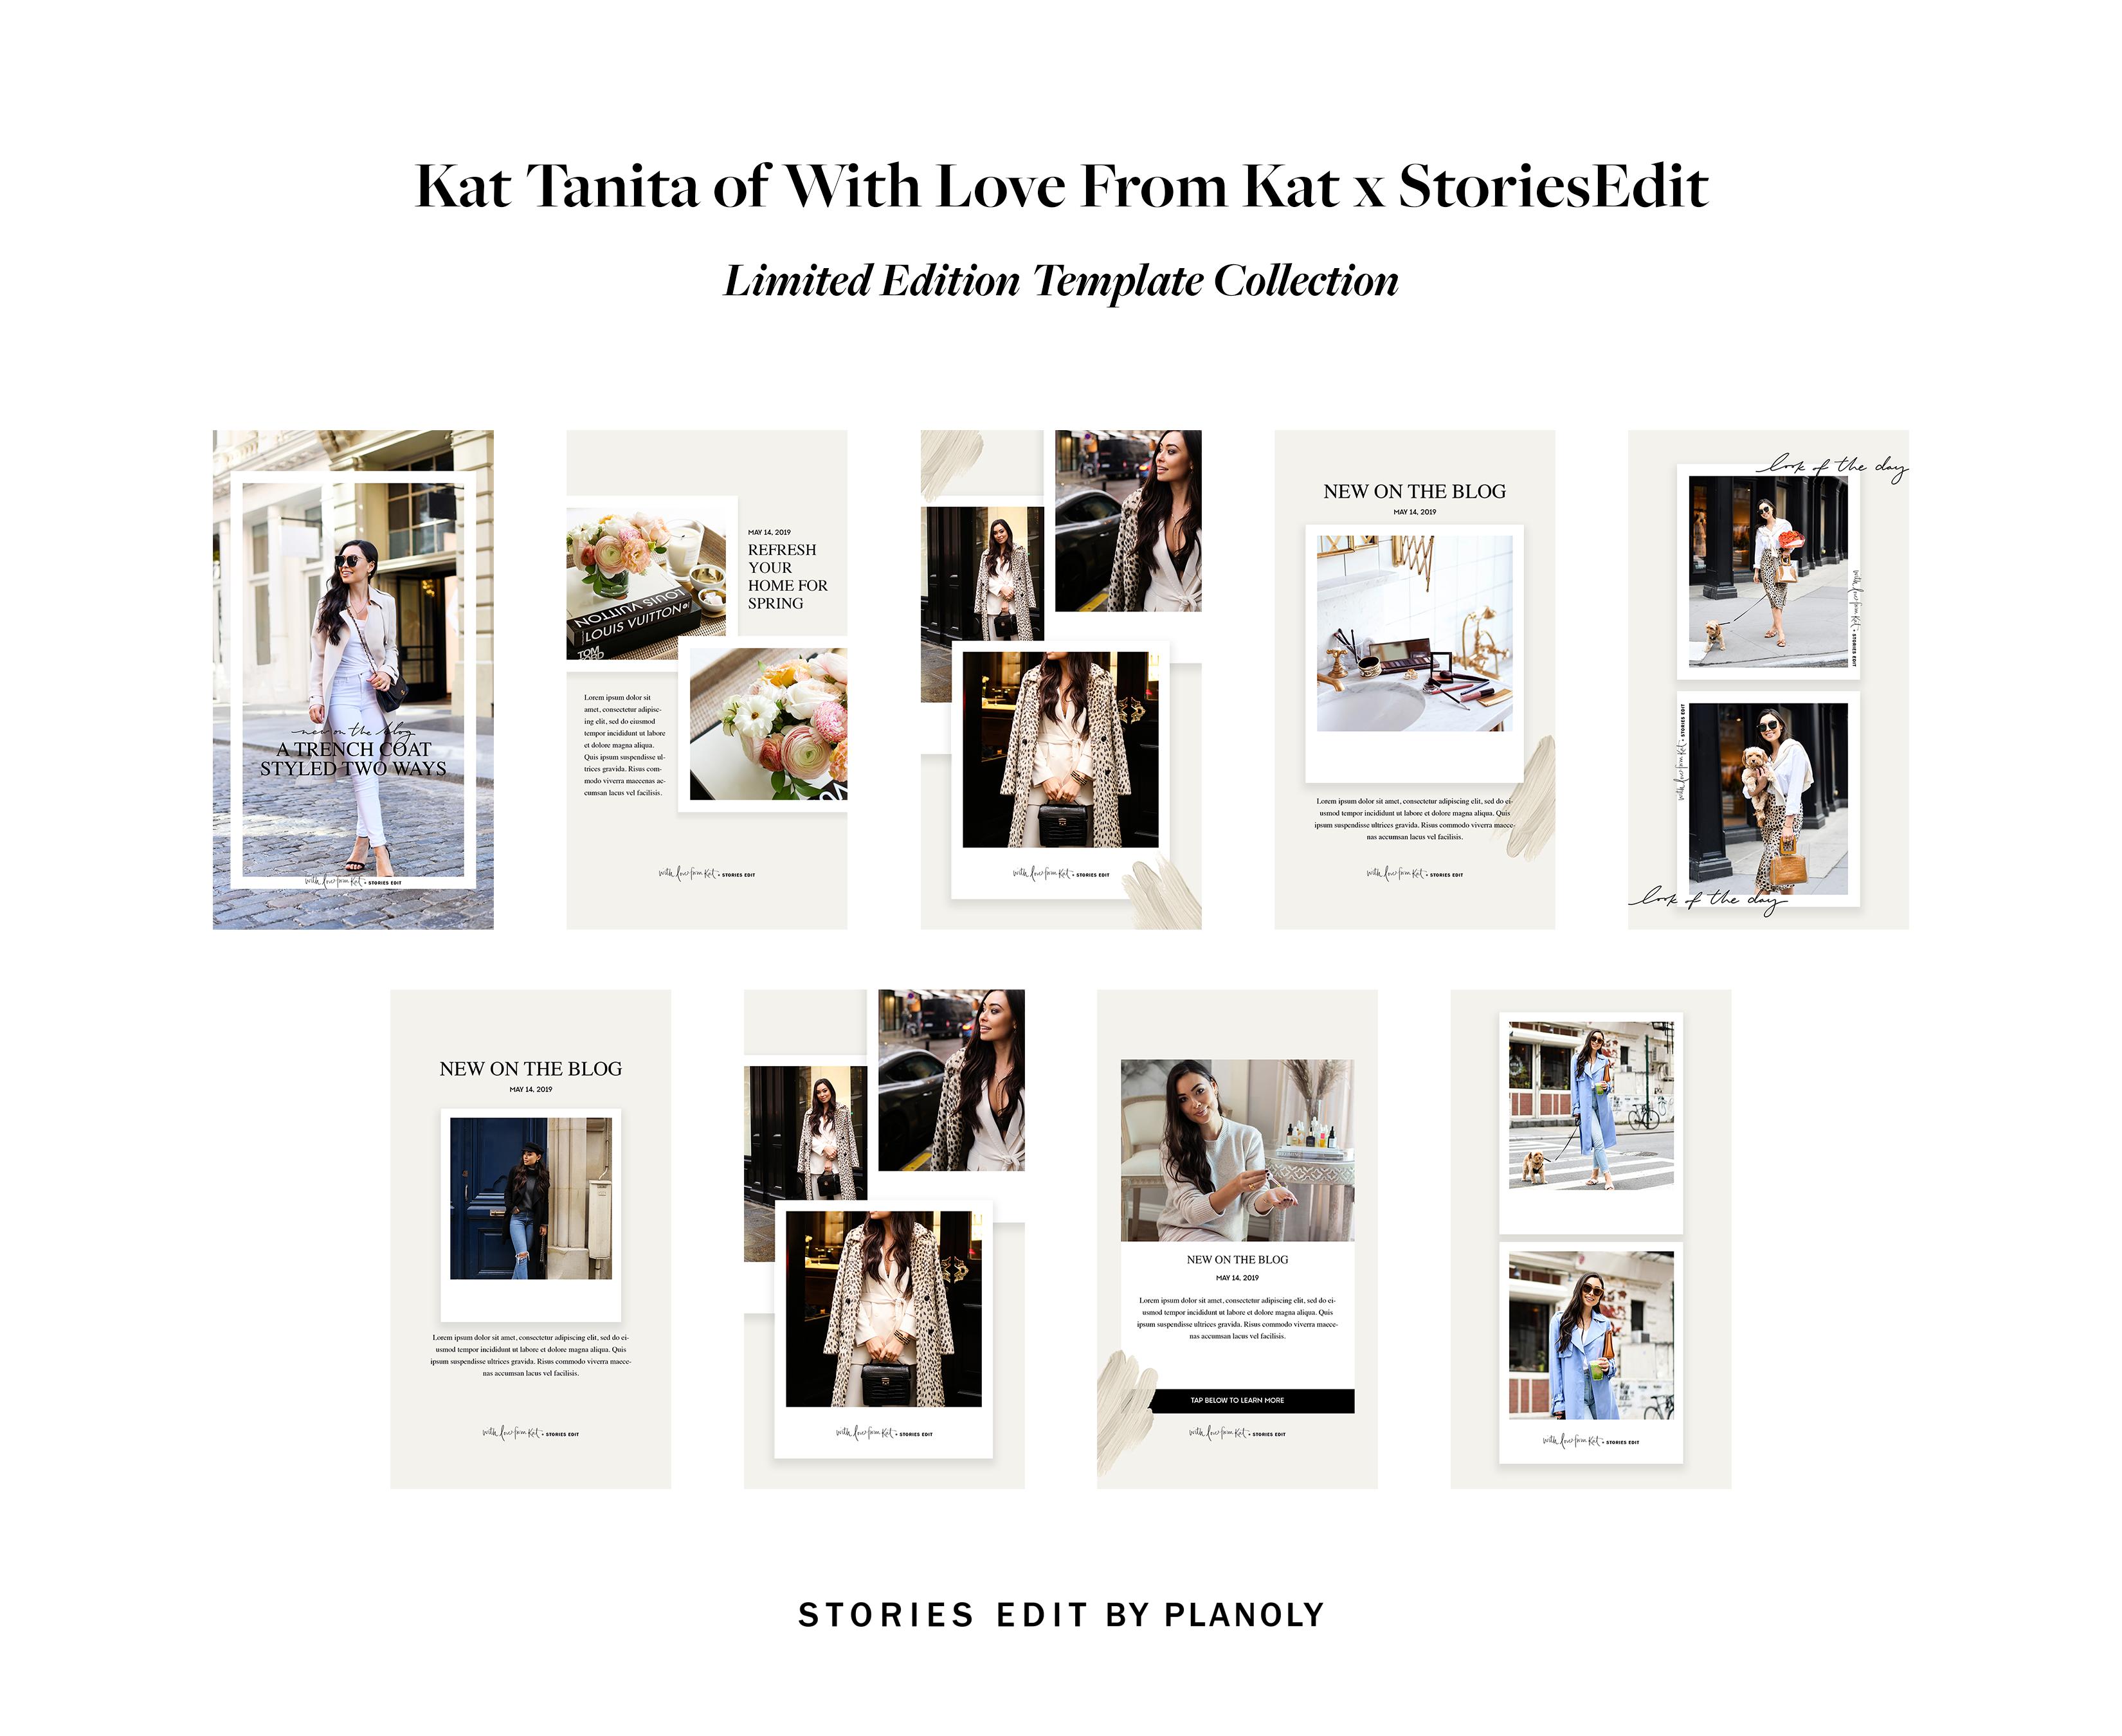 Kat Tanita x StoriesEdit Template Collection